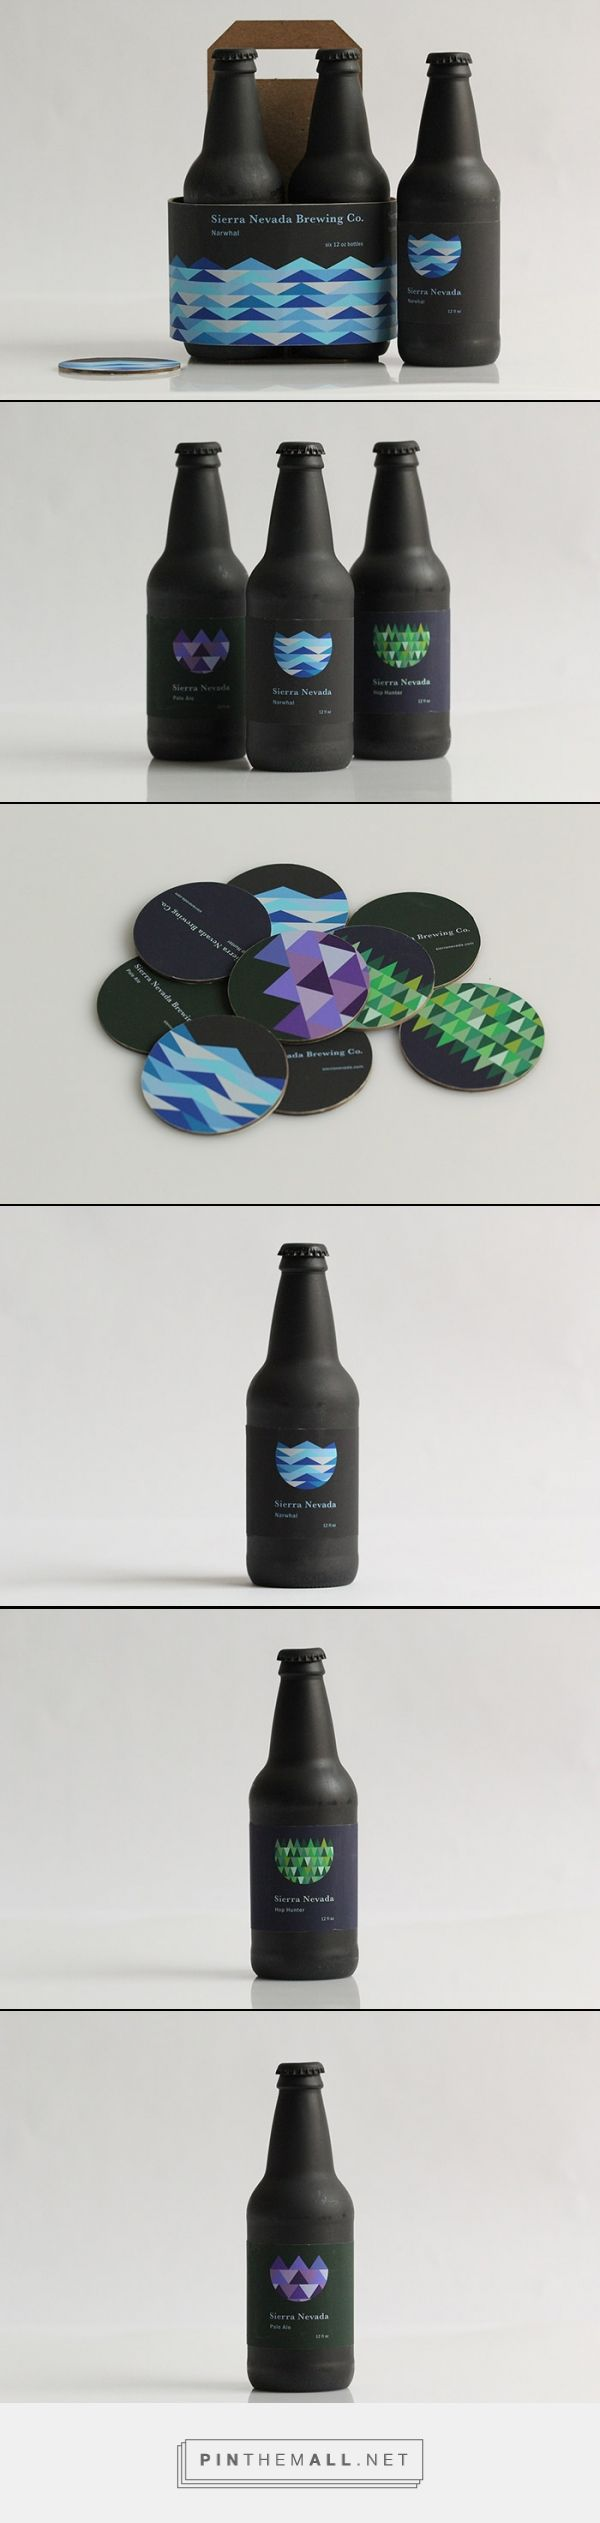 Sierra Nevada Rebrand - Daily Package Design InspirationDaily Package Design Inspiration